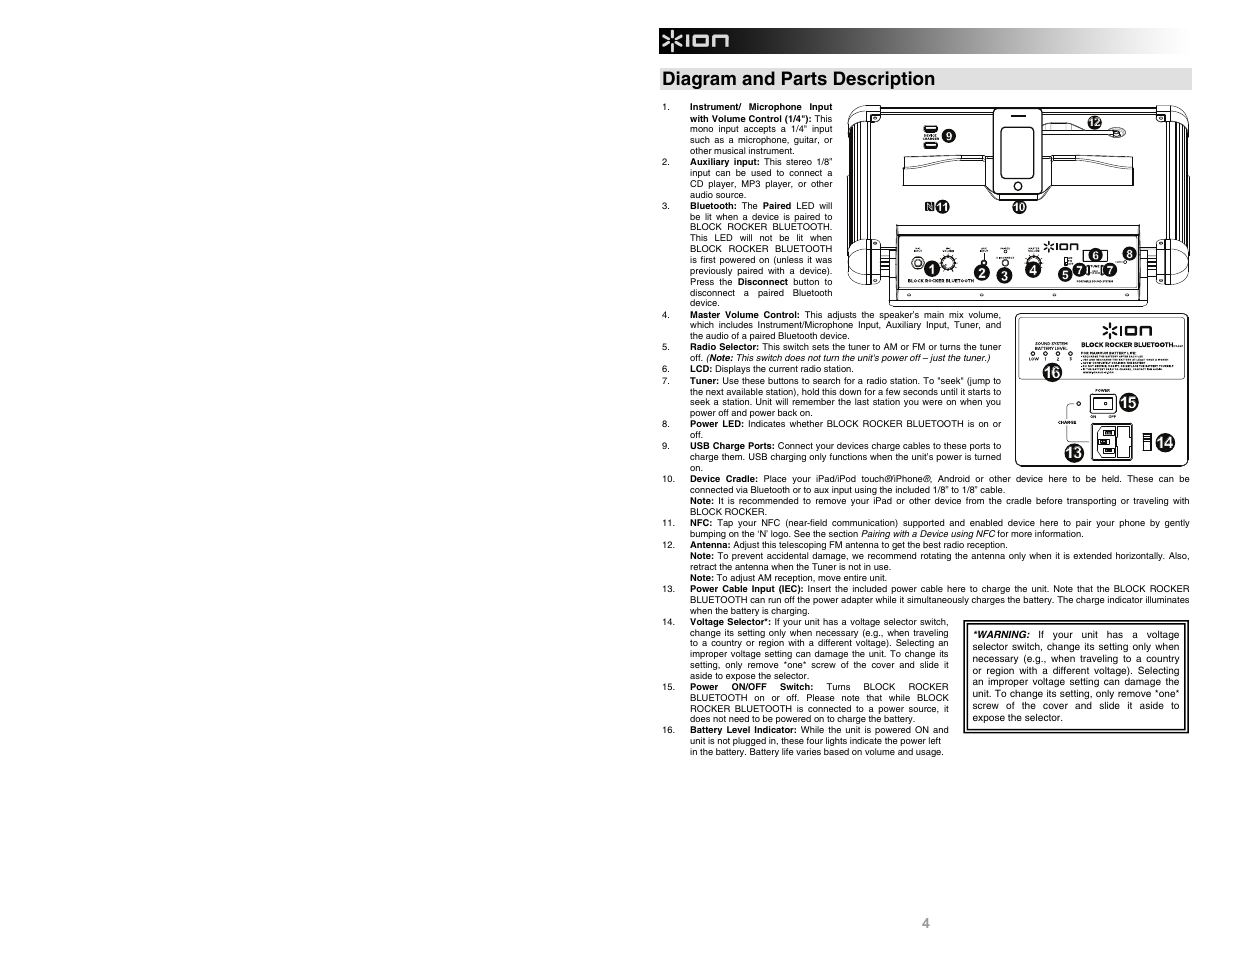 Diagram and parts description | ION Audio Block Rocker Bluetooth iPA56C User  Manual | Page 4